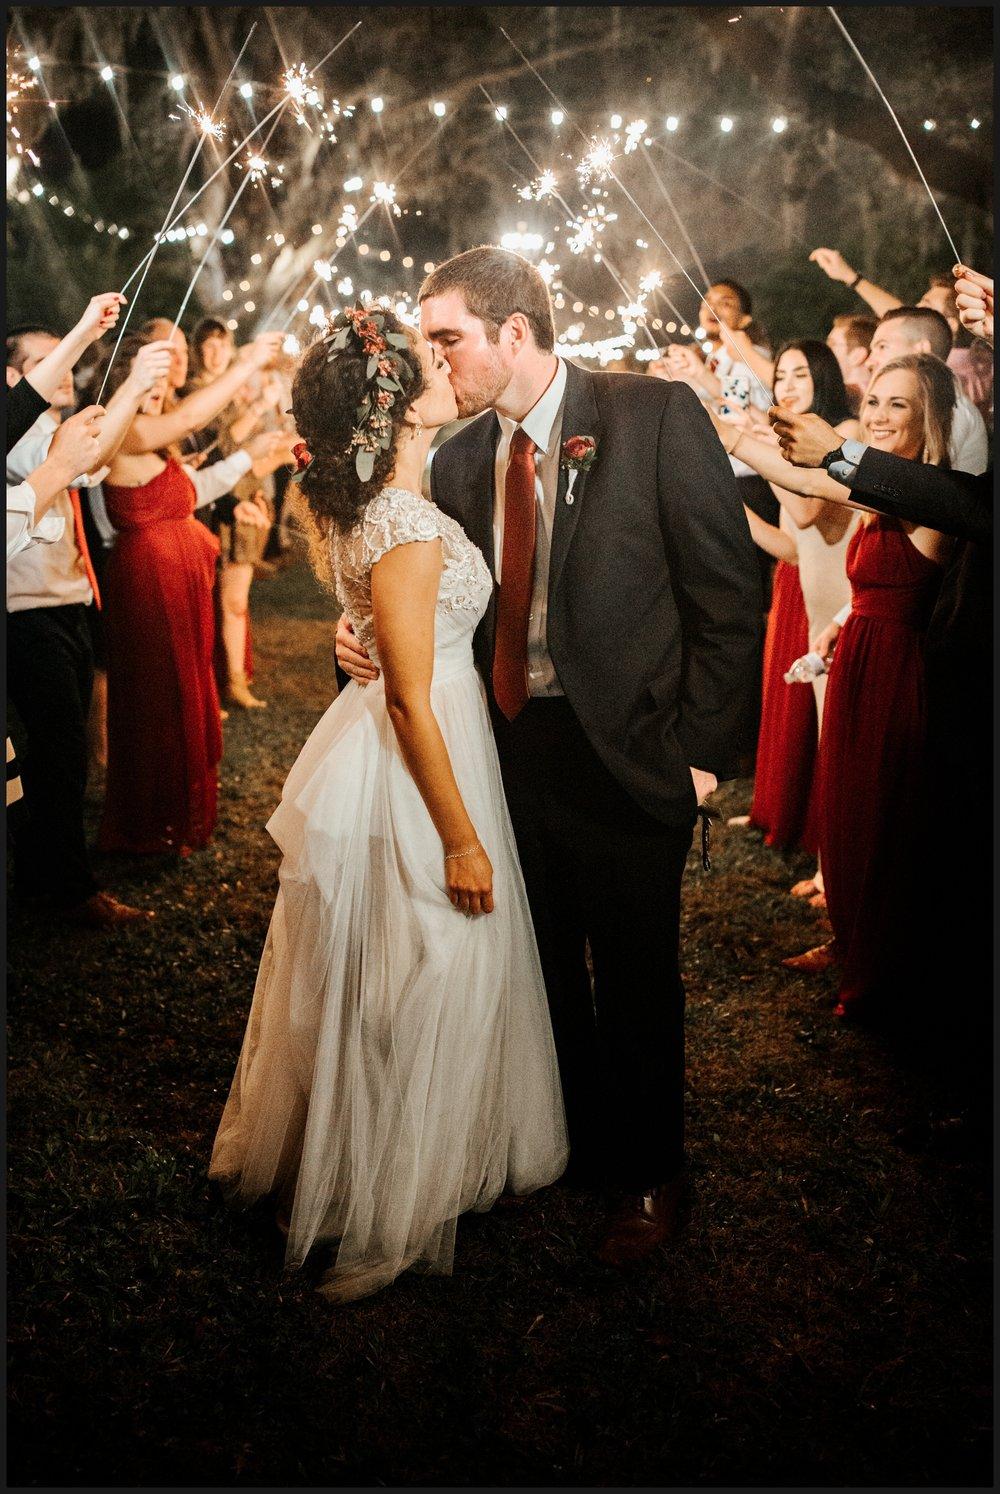 Orlando-Wedding-Photographer-destination-wedding-photographer-florida-wedding-photographer-bohemian-wedding-photographer_1243.jpg